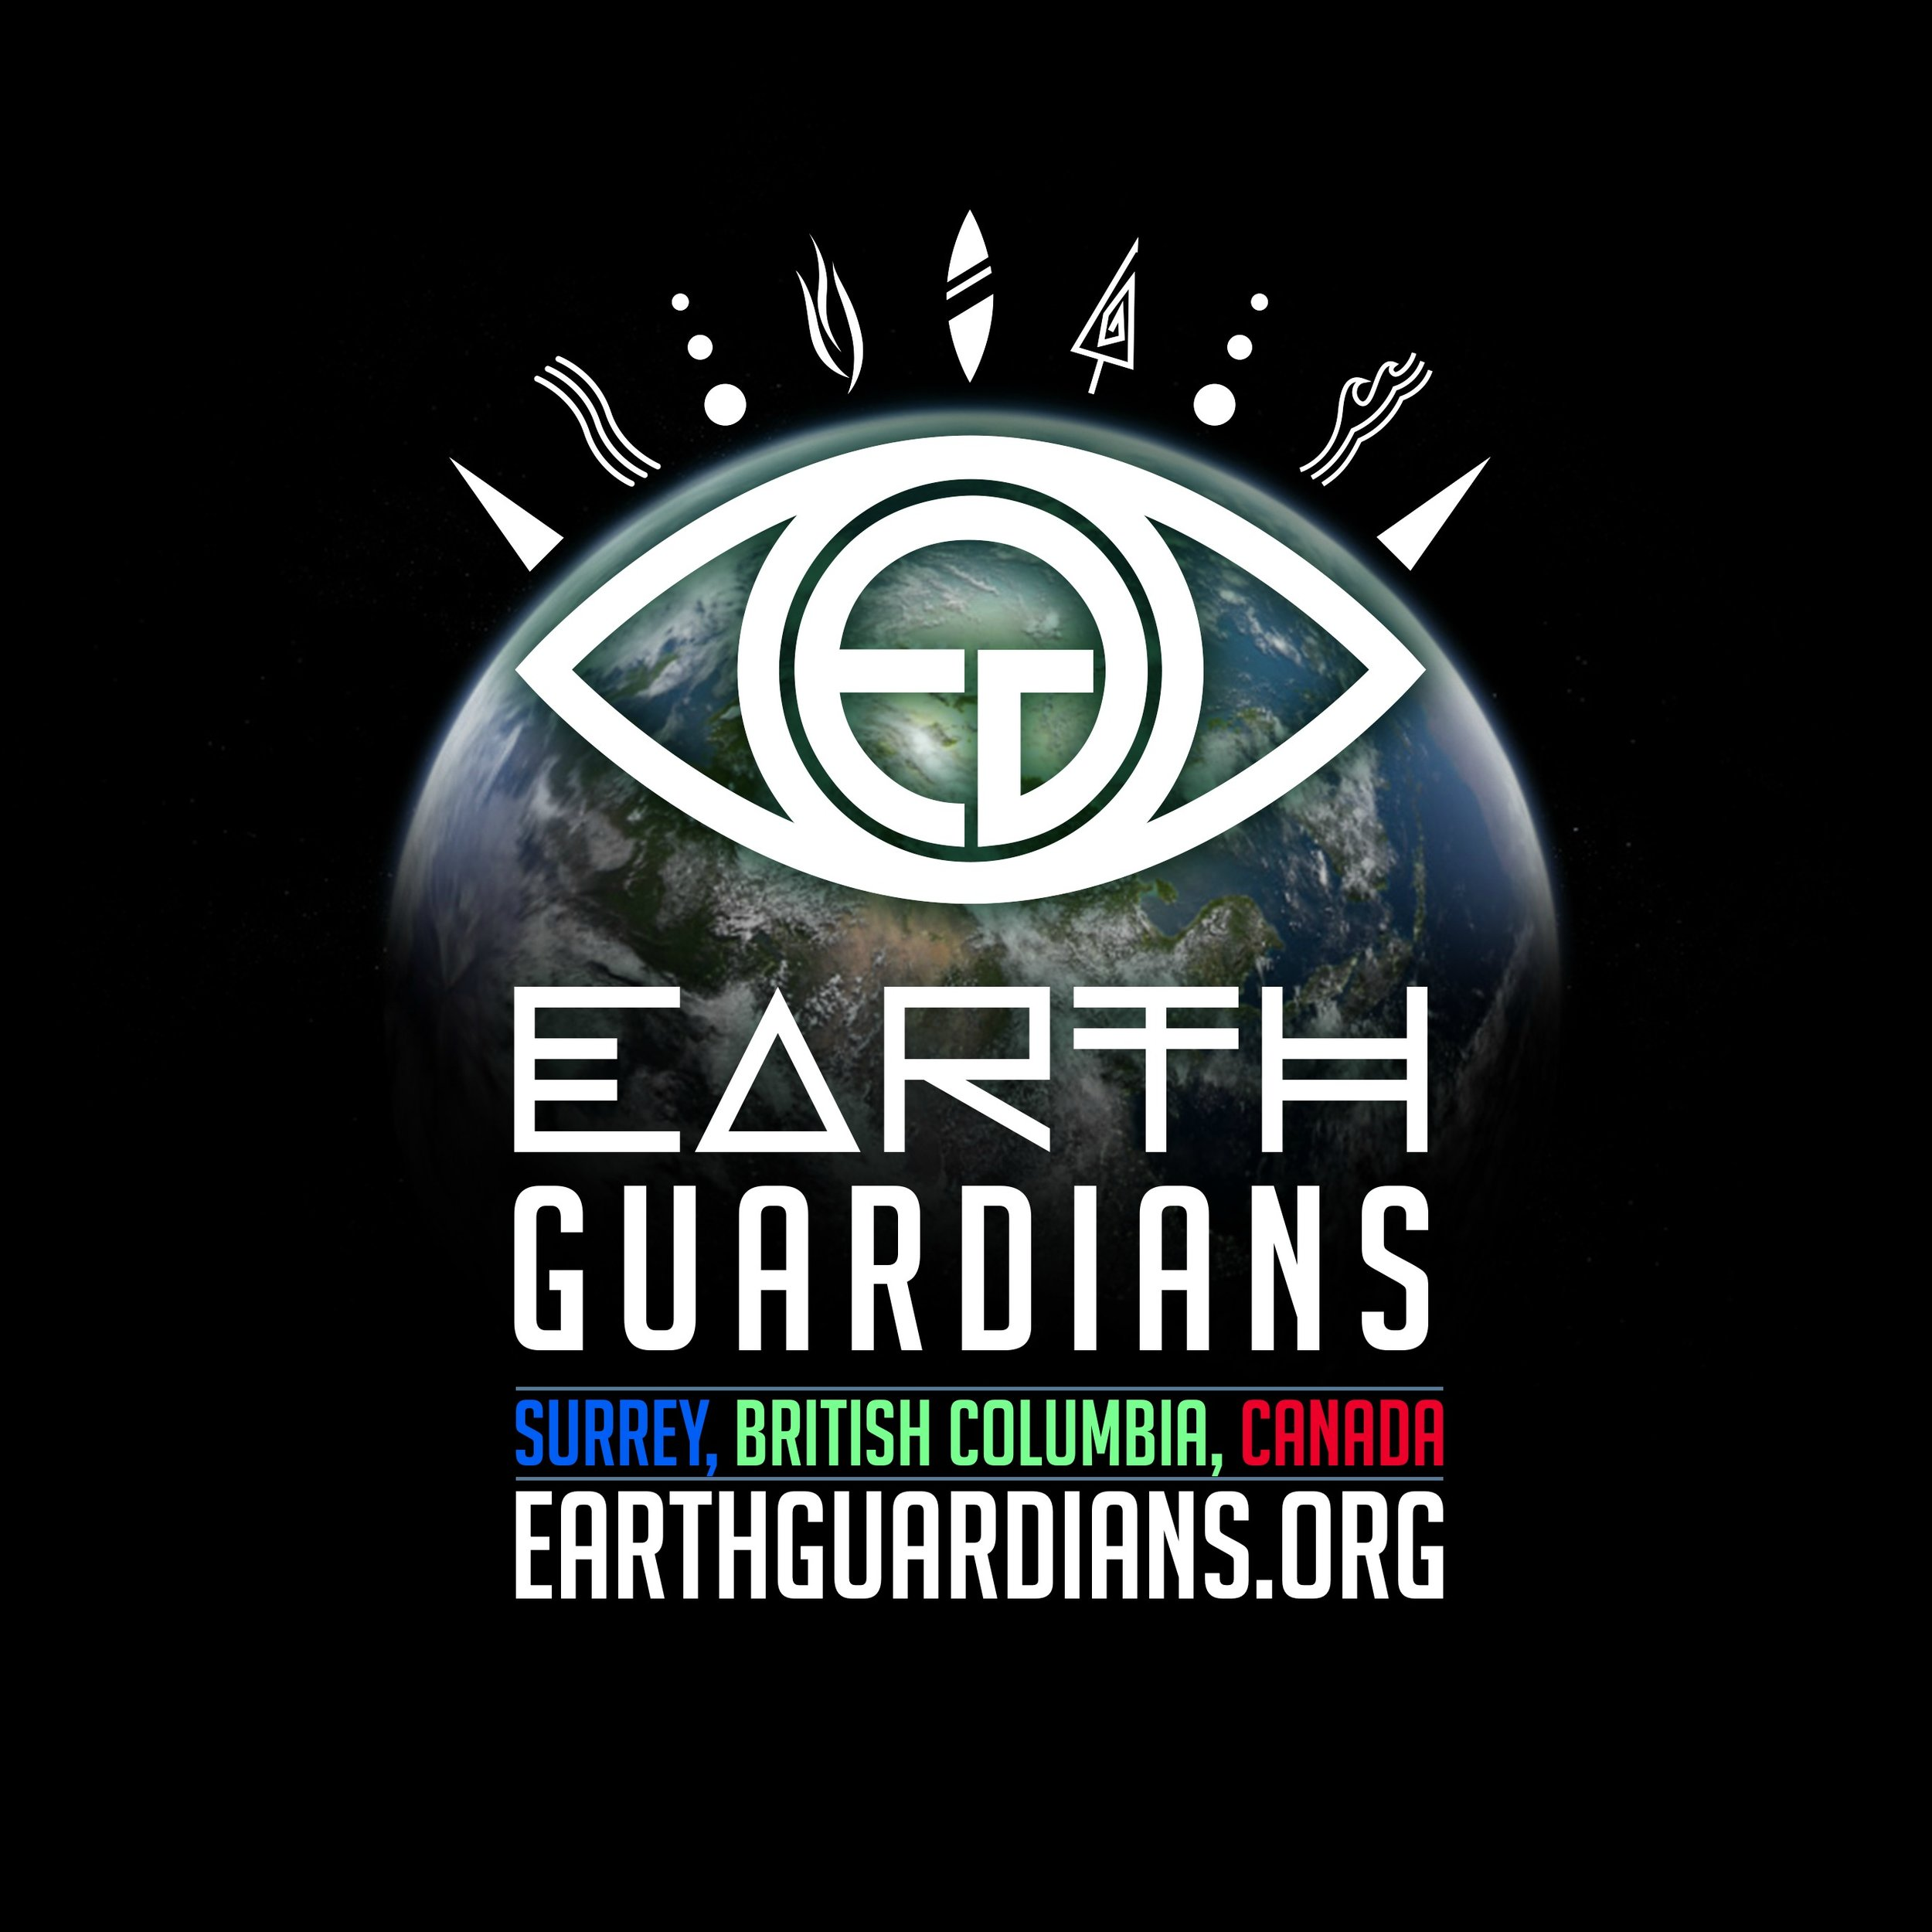 EG_crew logo SURREY BC.jpg